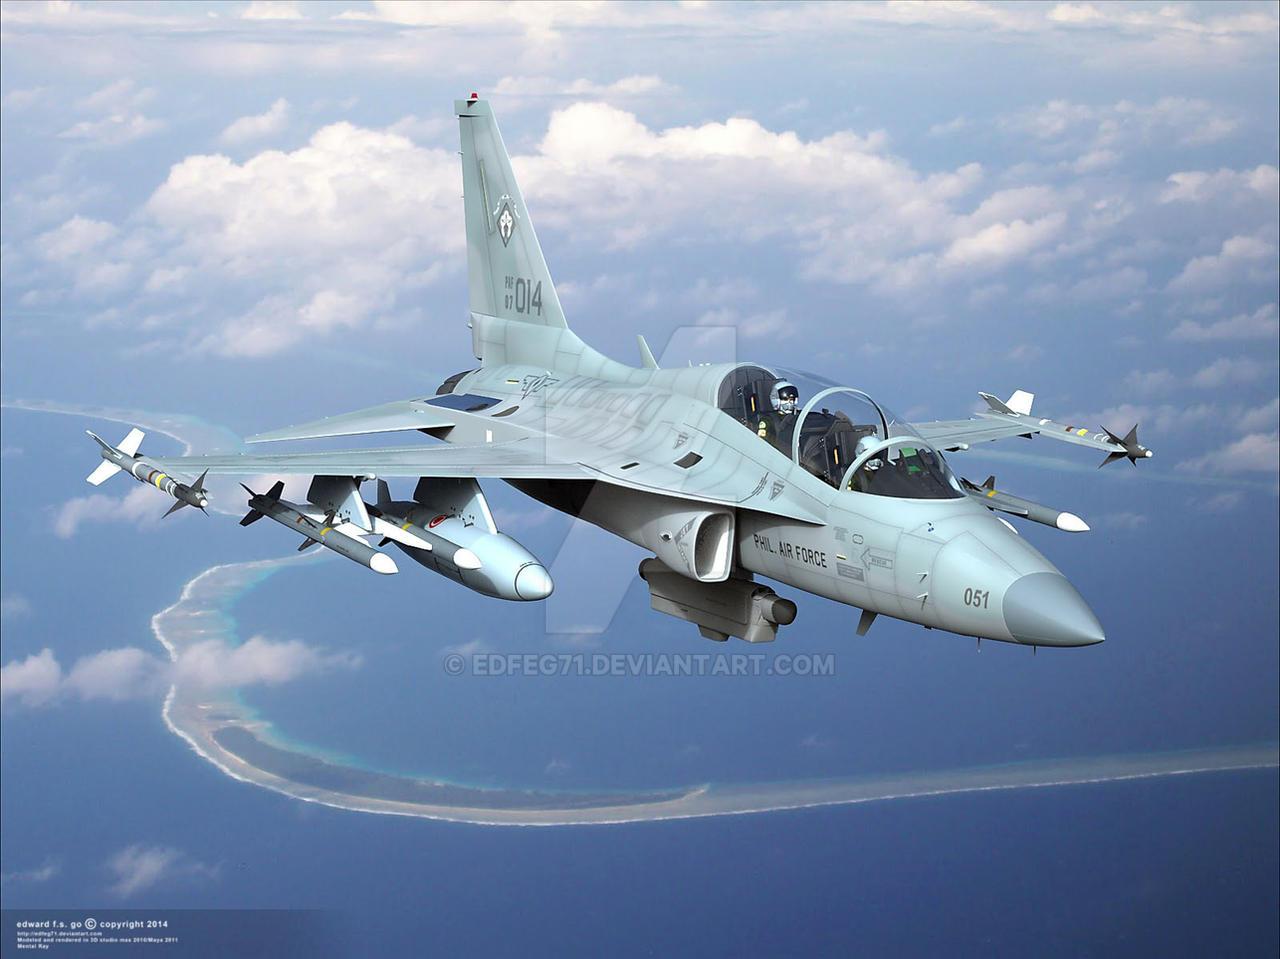 الوداع المؤجل - A-10 Thunderbolt II - صفحة 2 Fa_50_phaf_lonewolfe_by_edfeg71-d7pw1nx